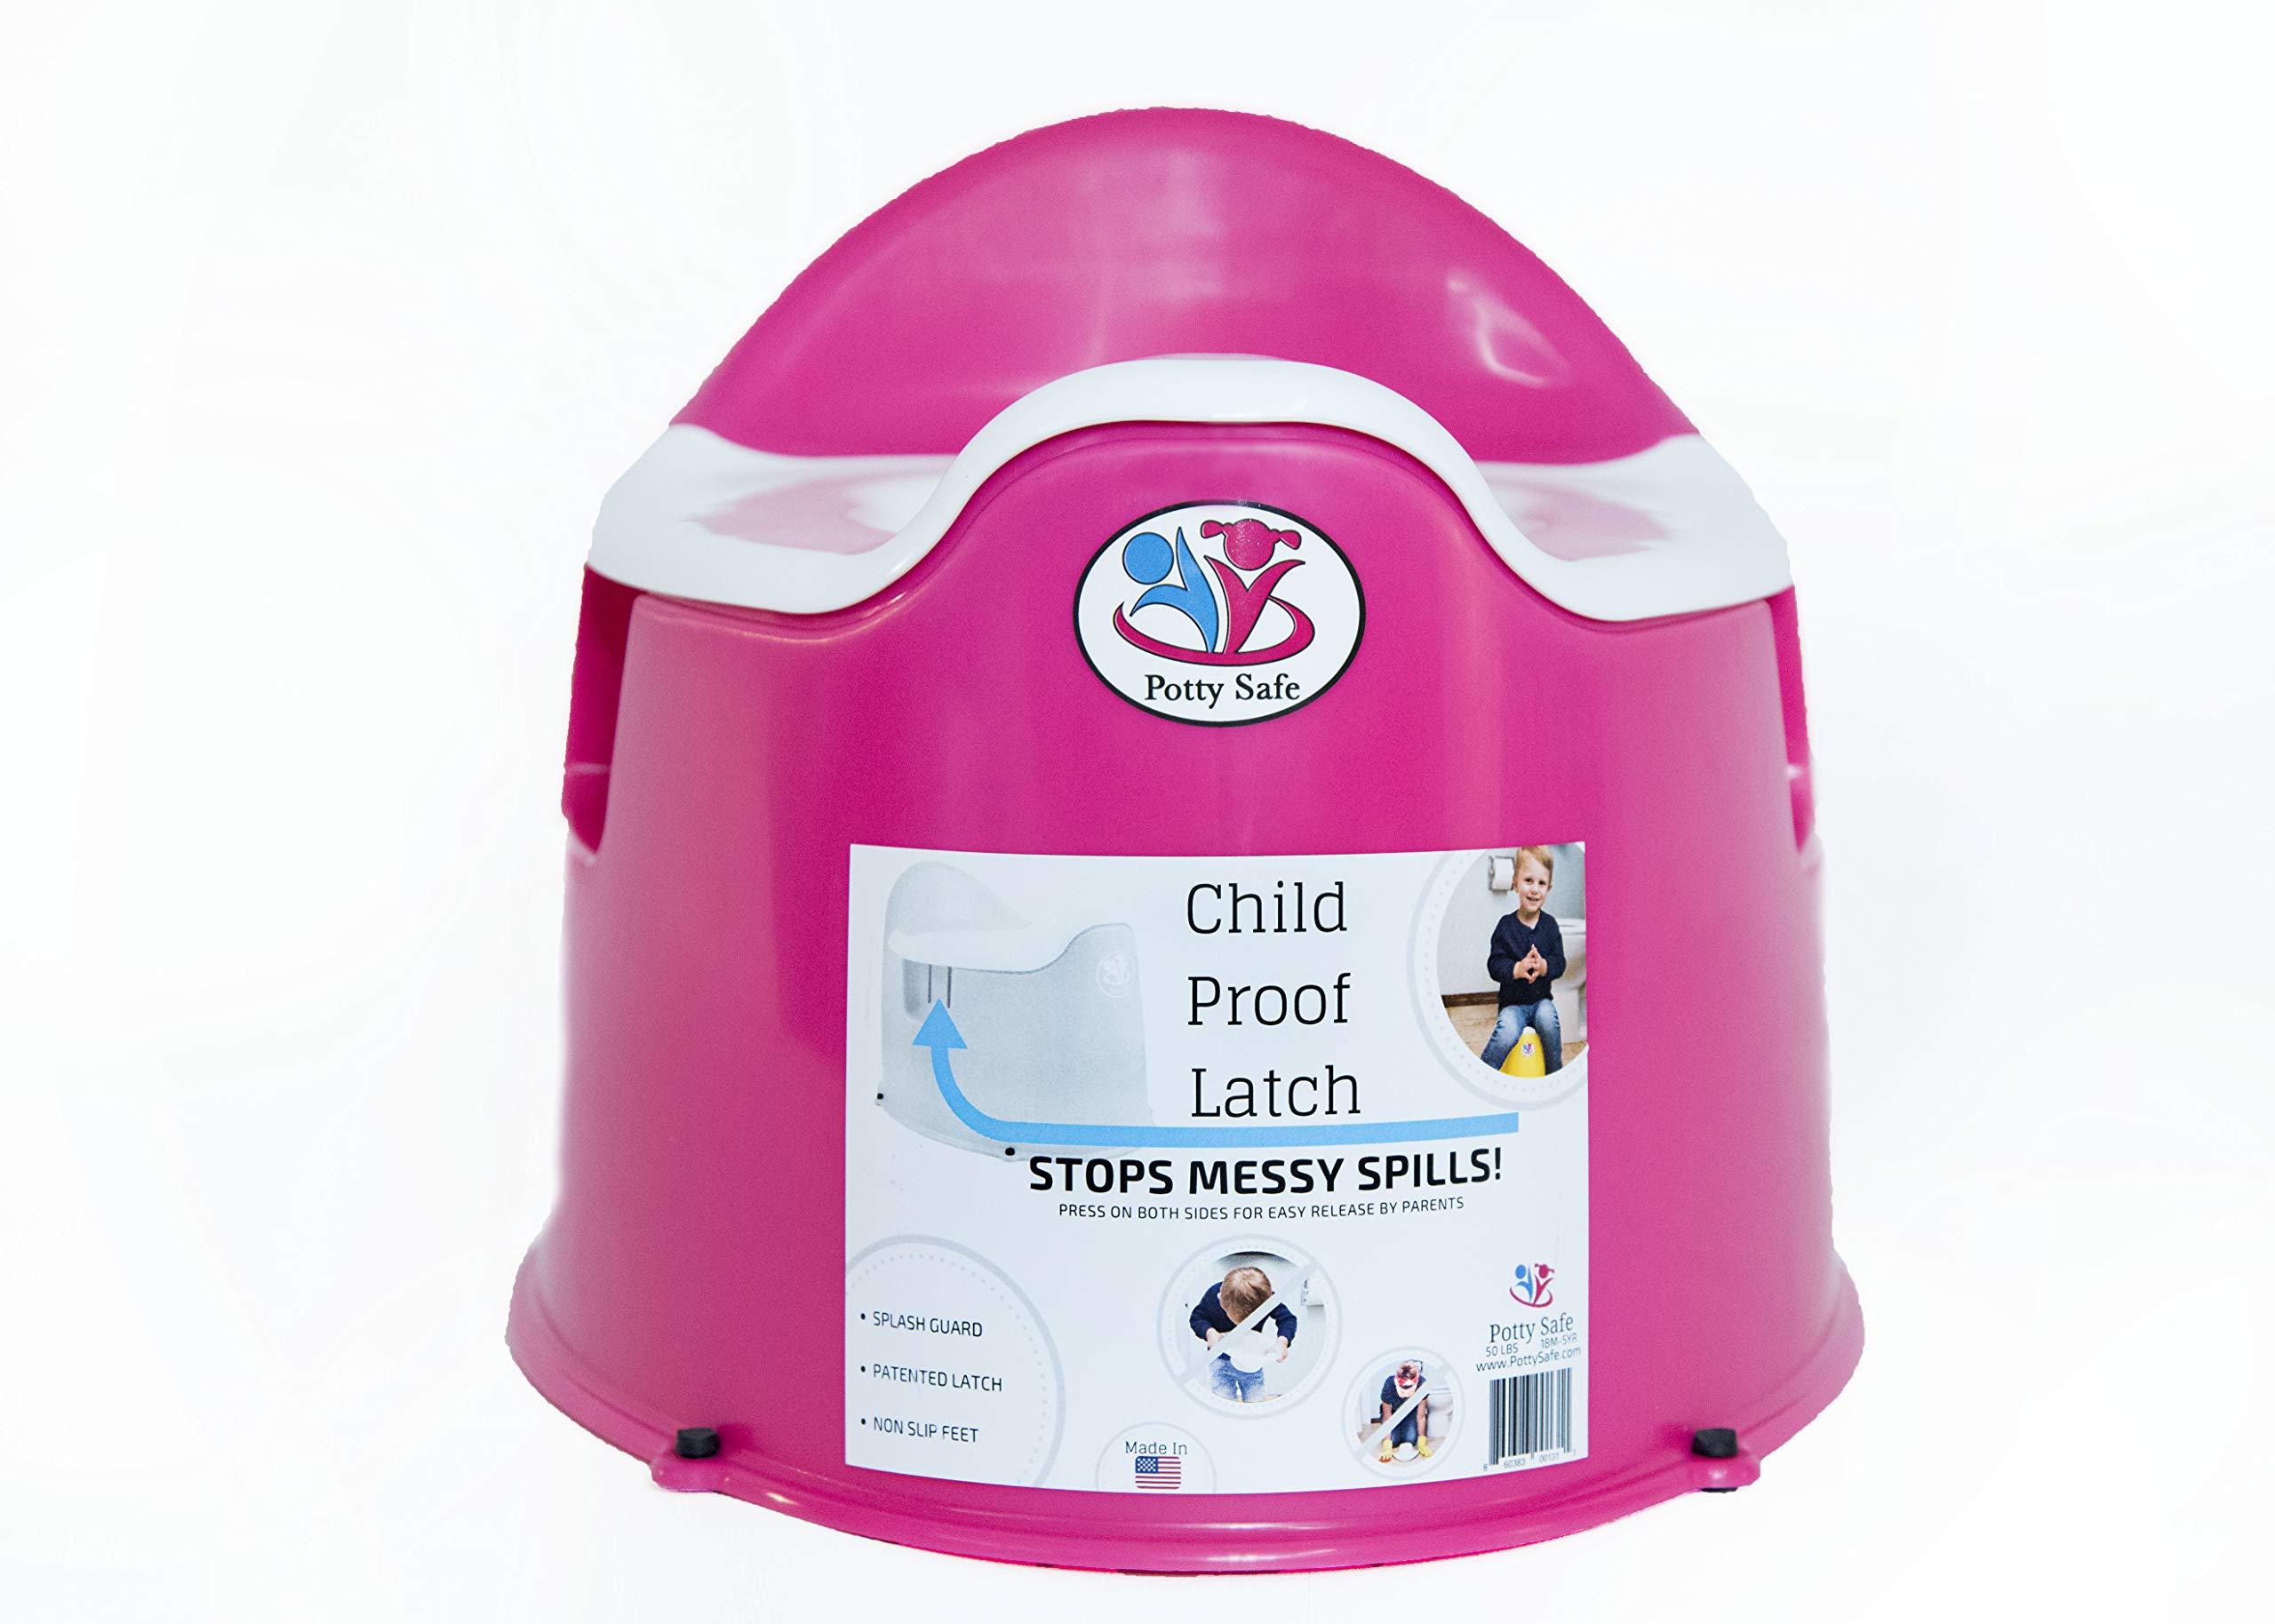 Potty Safe-Potty Training Toilet w/Child Proof Latch; Potty Chair; Training Potty;Potty Training; Toilet Training; Kids Potty Chair; Made in USA; Child Potty Chair; Potty seat; Non Slip feet (Pink)